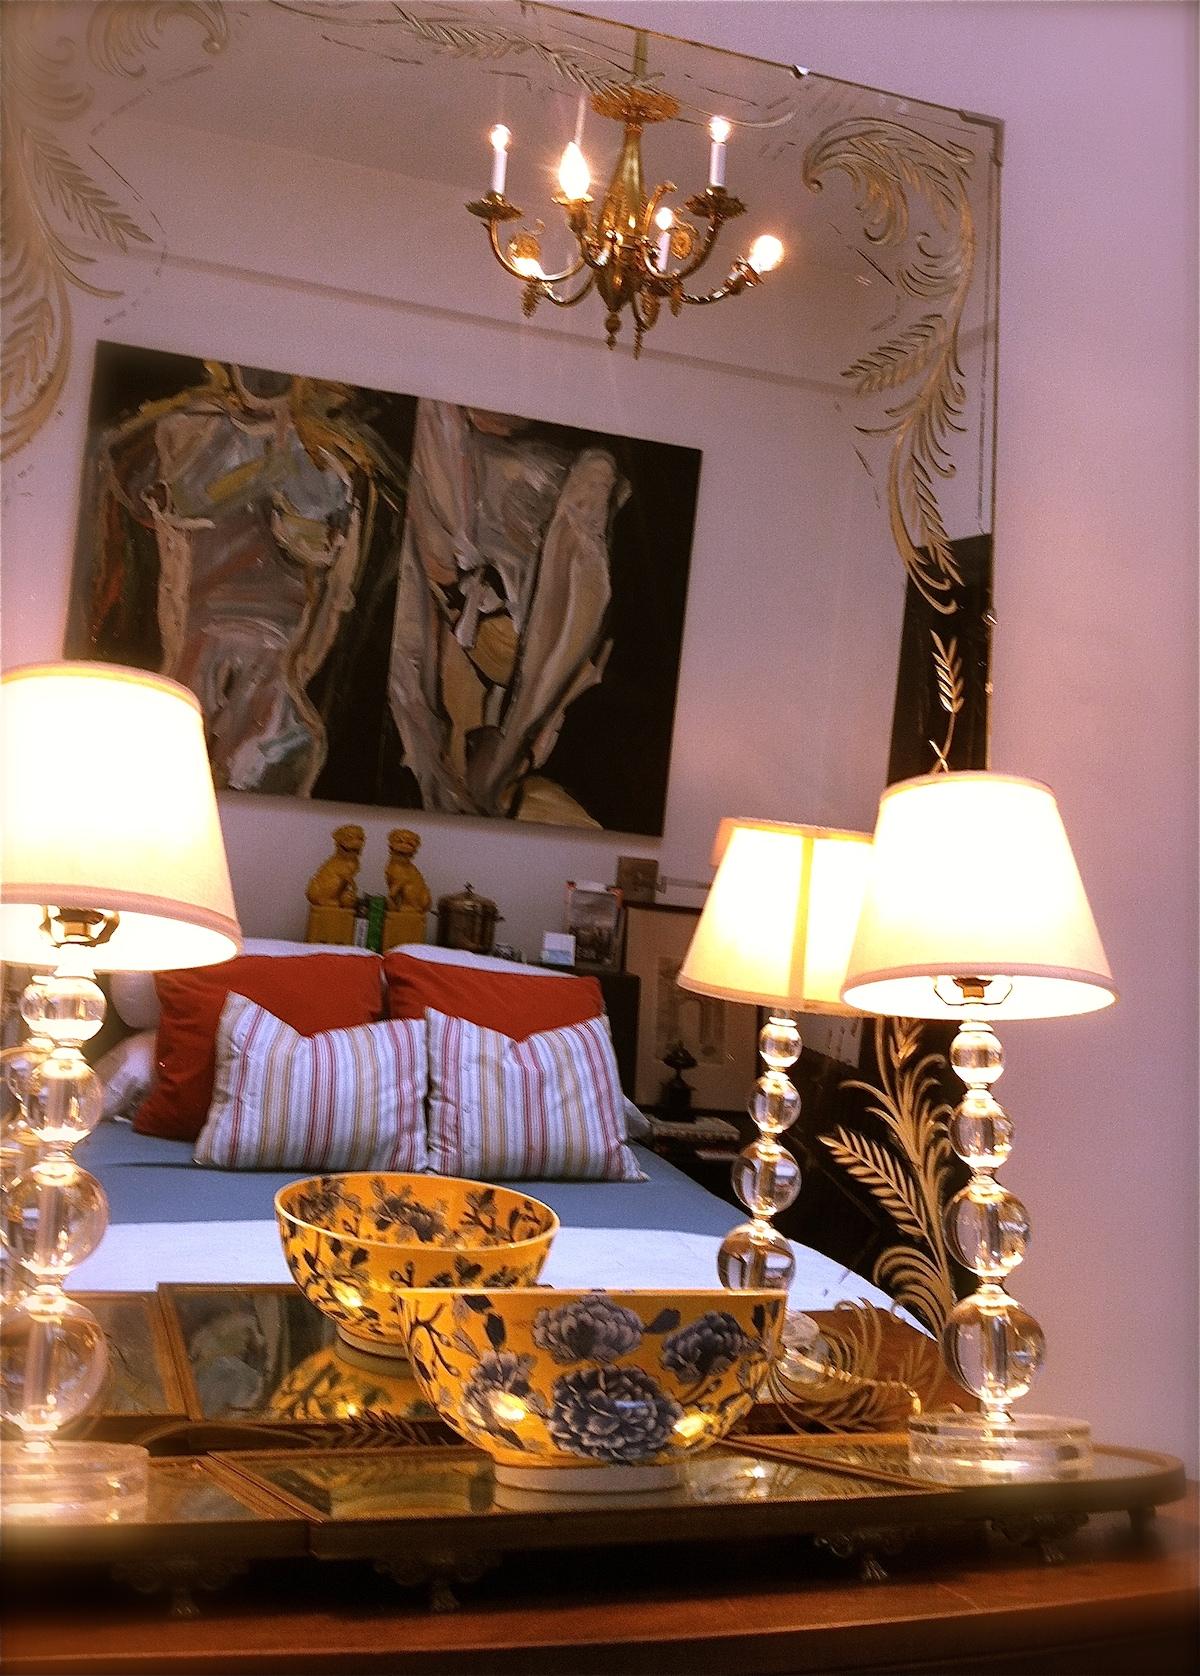 Spacious private room with original artwork, full antique vanity and mirror.